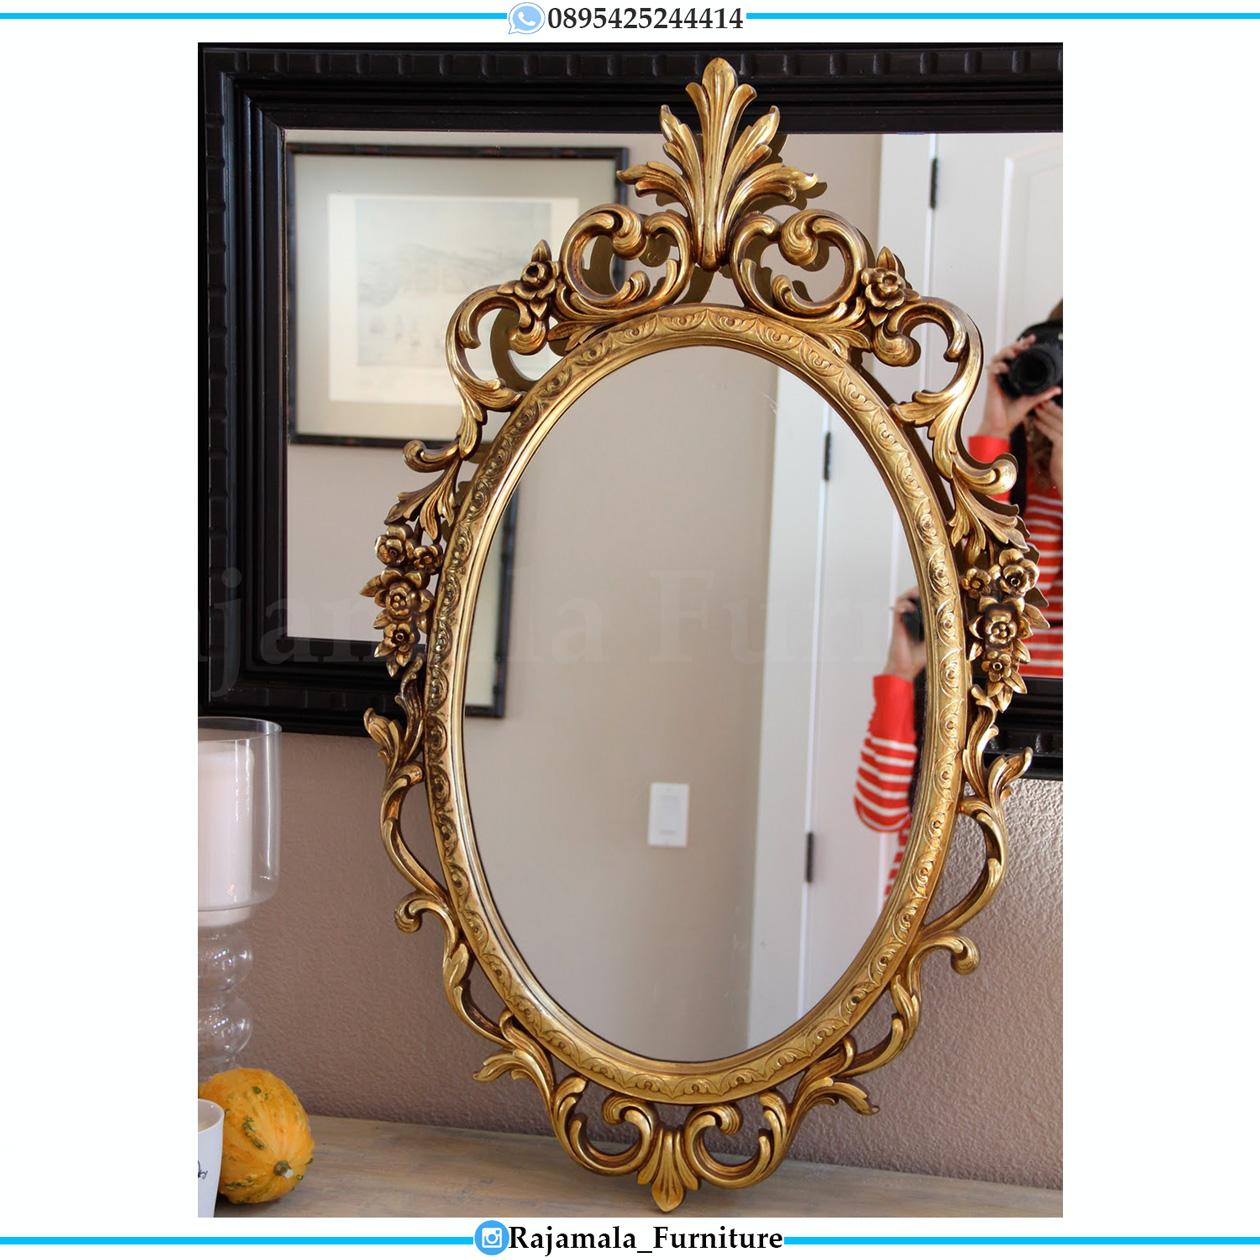 Cermin Hias Mewah Ukiran Luxury Crown Classic Golden Glowing Jepara RM-0504